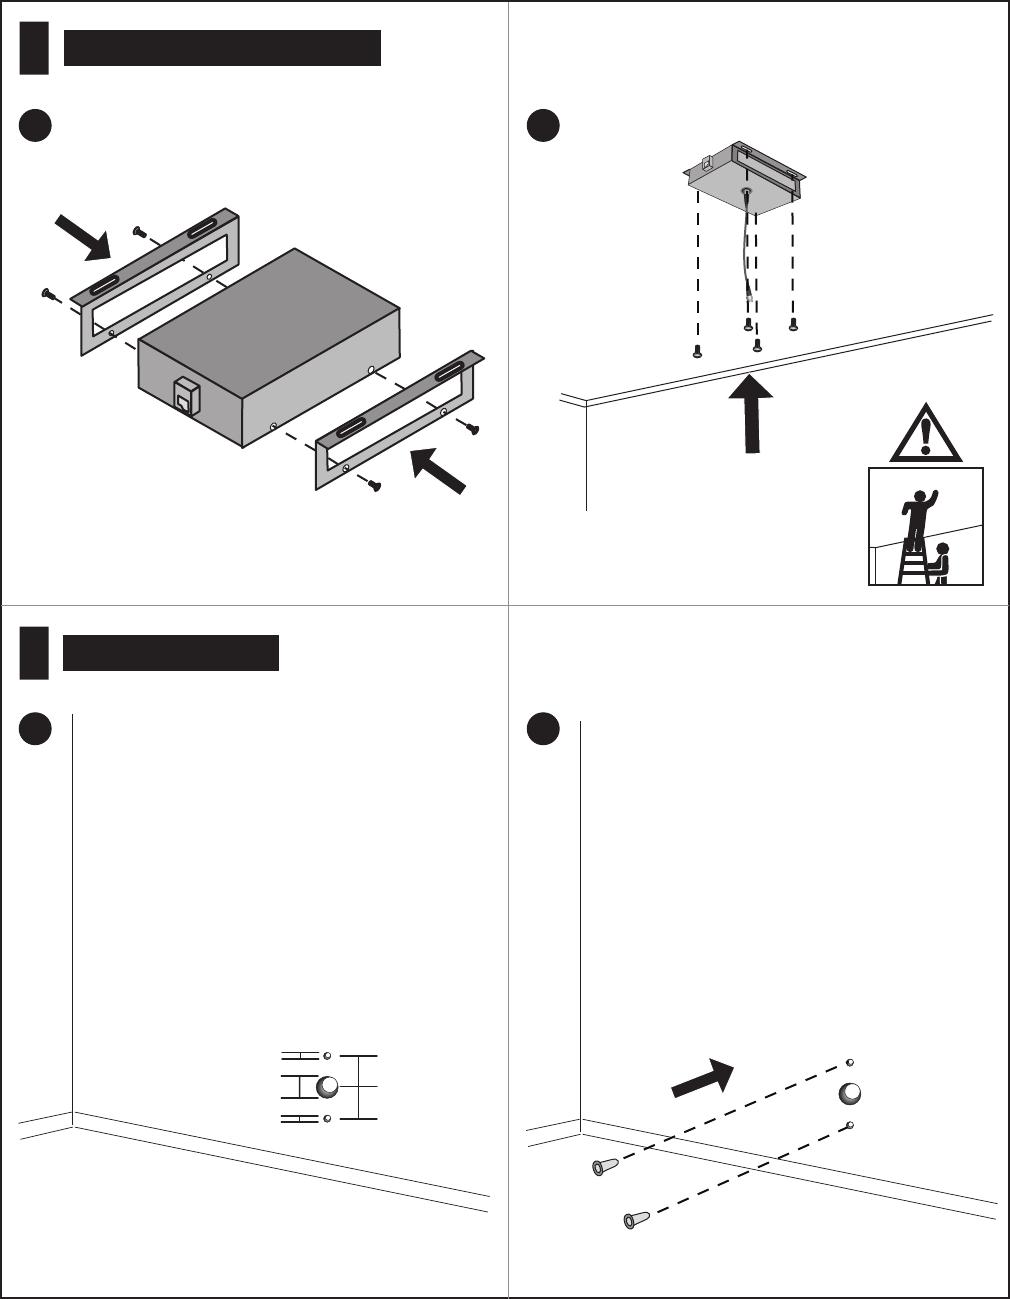 Polycom Vsxtm 5000 Users Manual Setting Up The VSX Ceiling